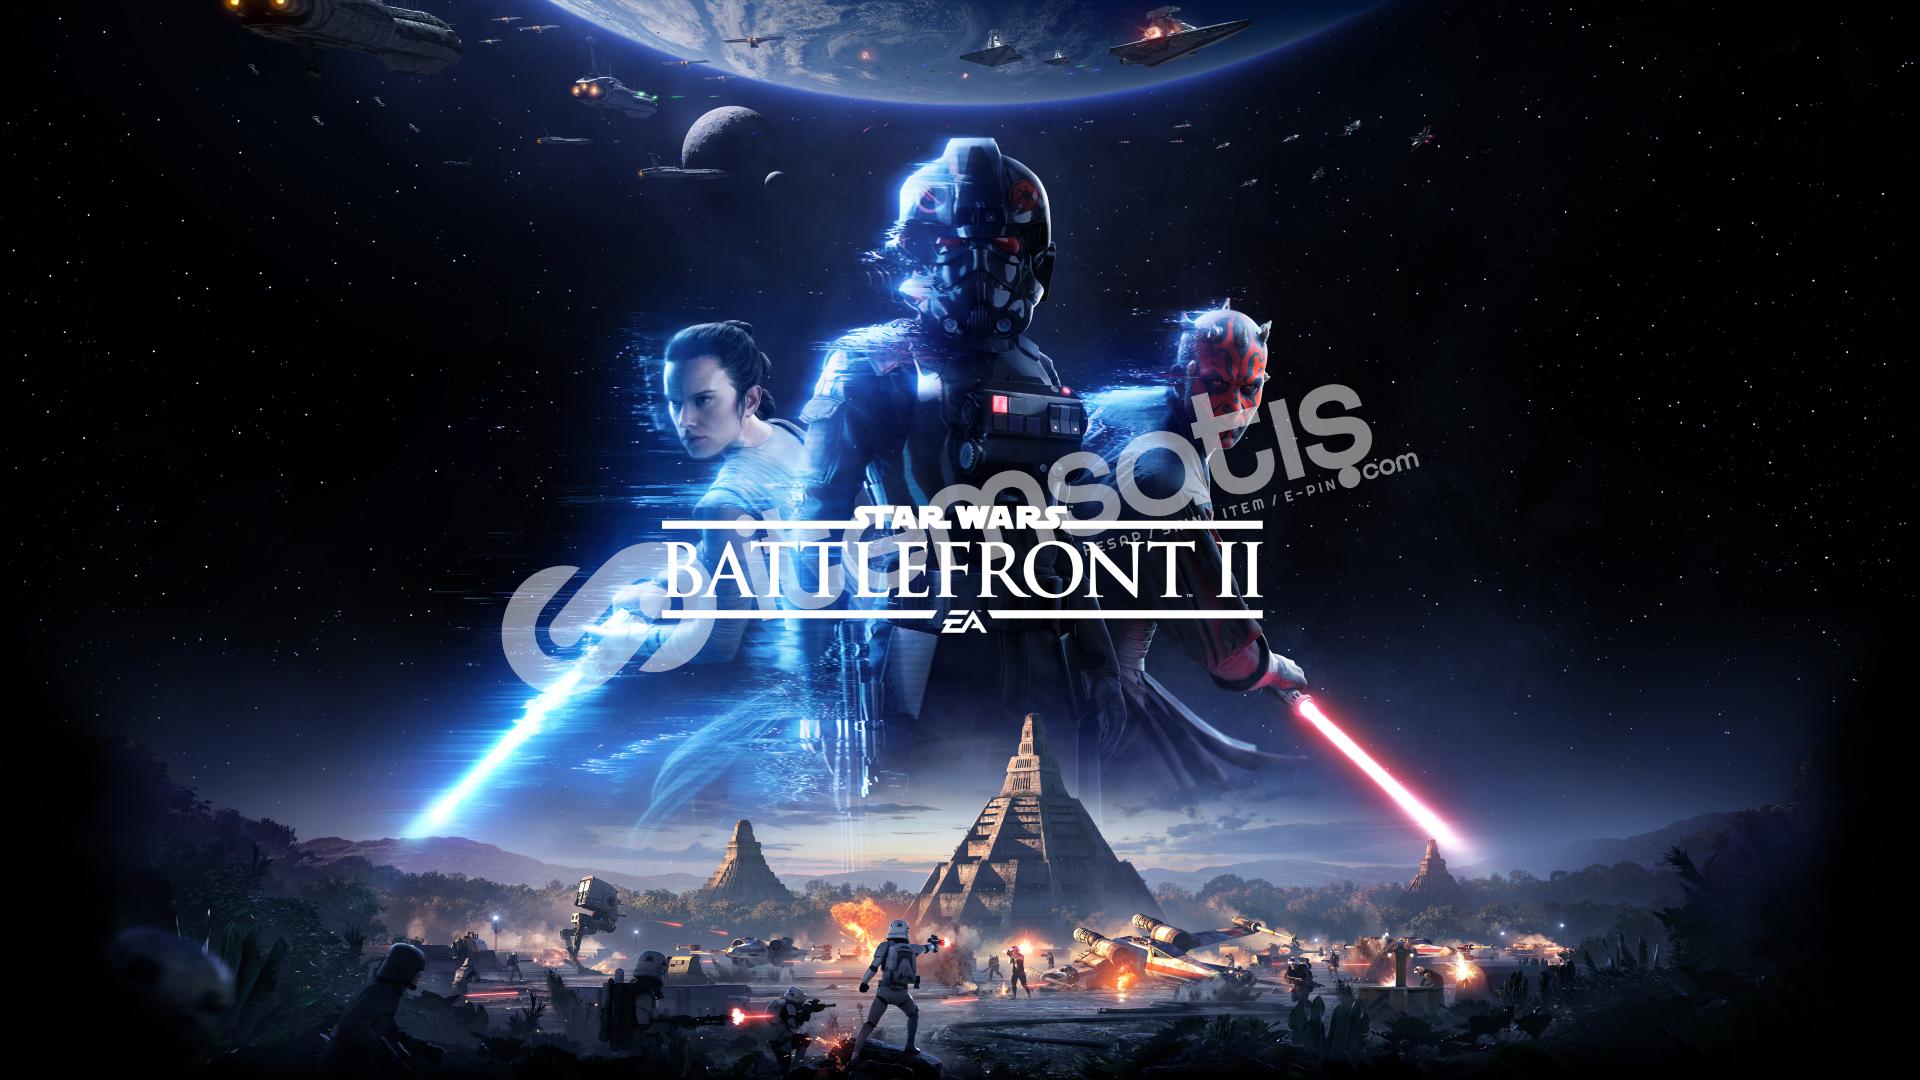 STAR WARS Battlefront 2 [5 Yıl Garanti]